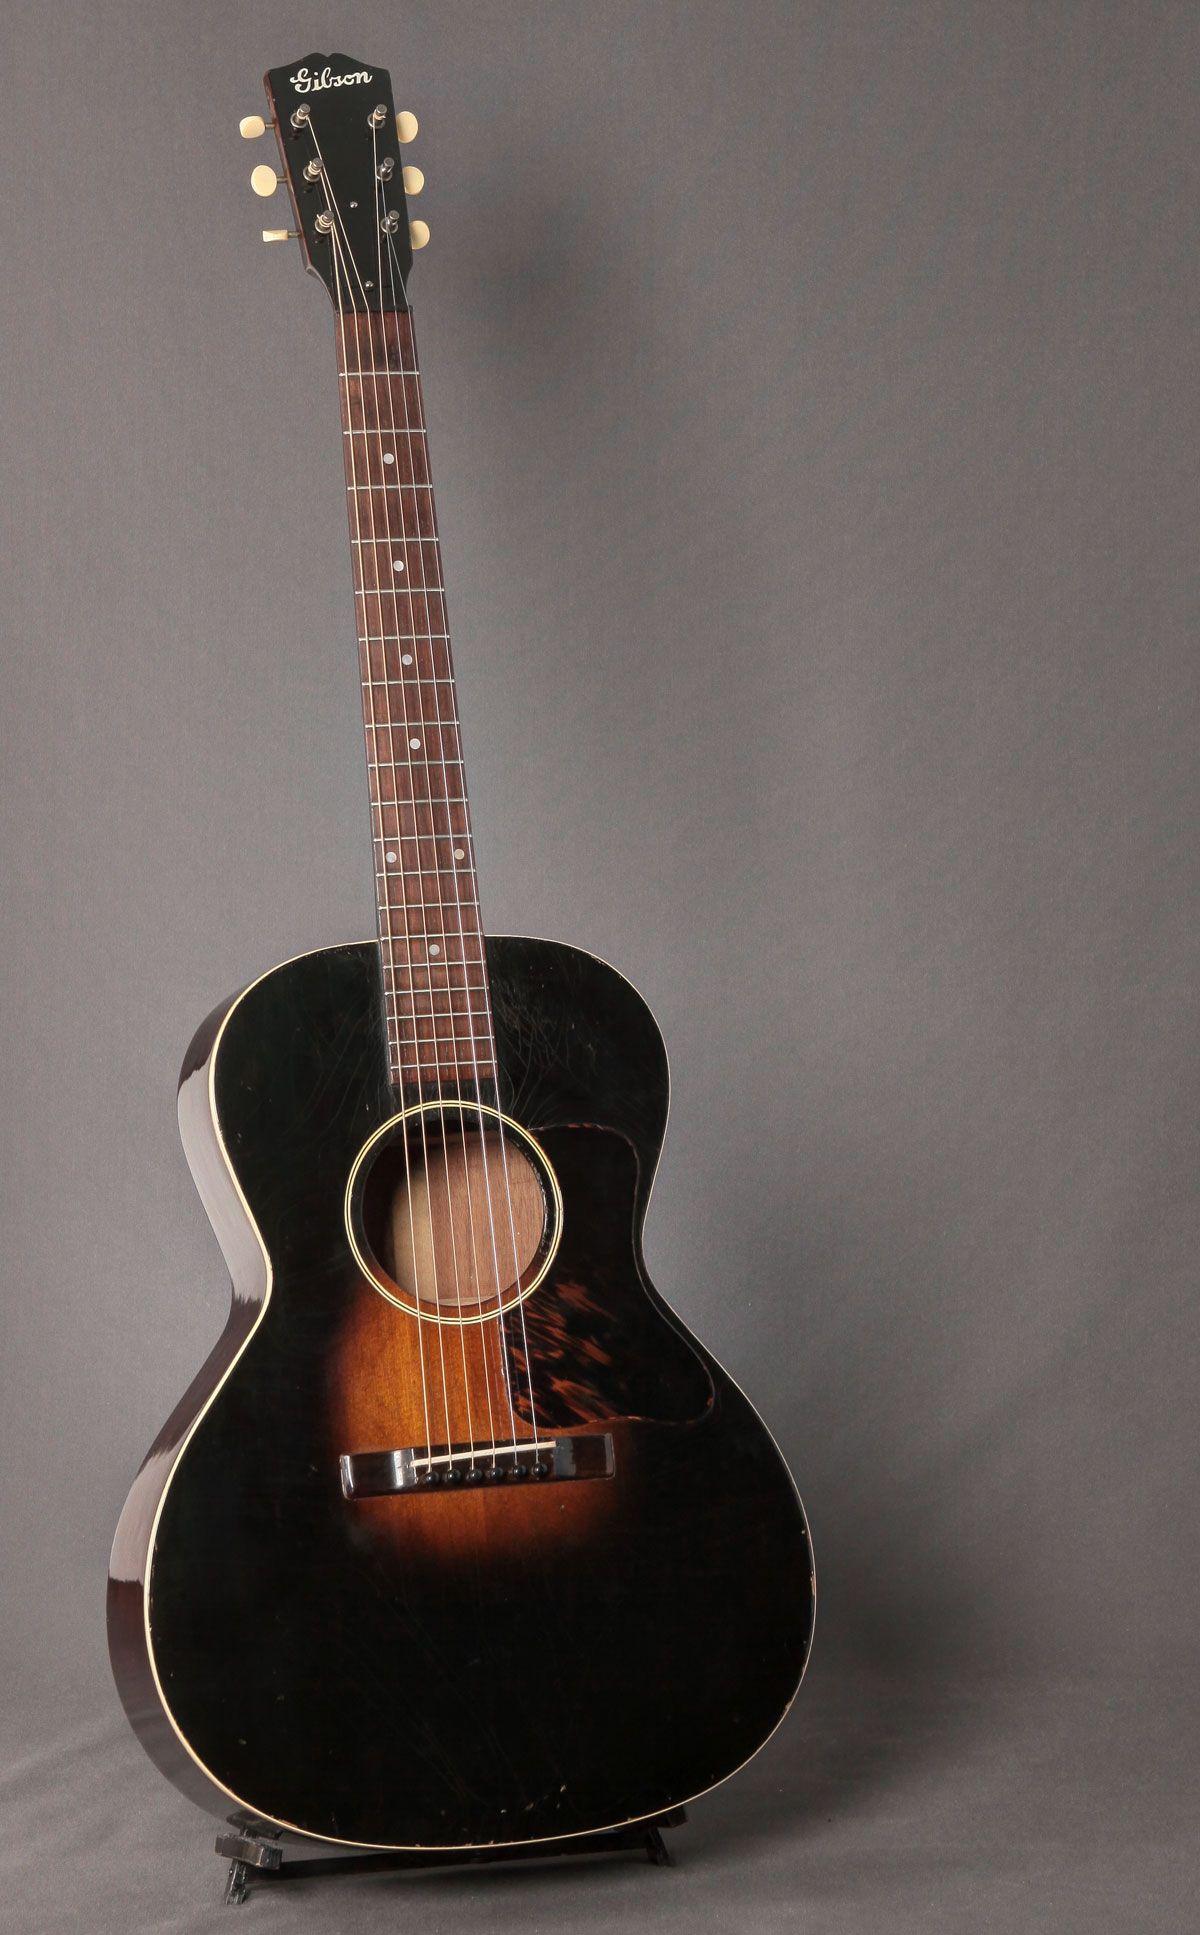 1934 Gibson L00 Guitar, Classic guitar, Acoustic guitar